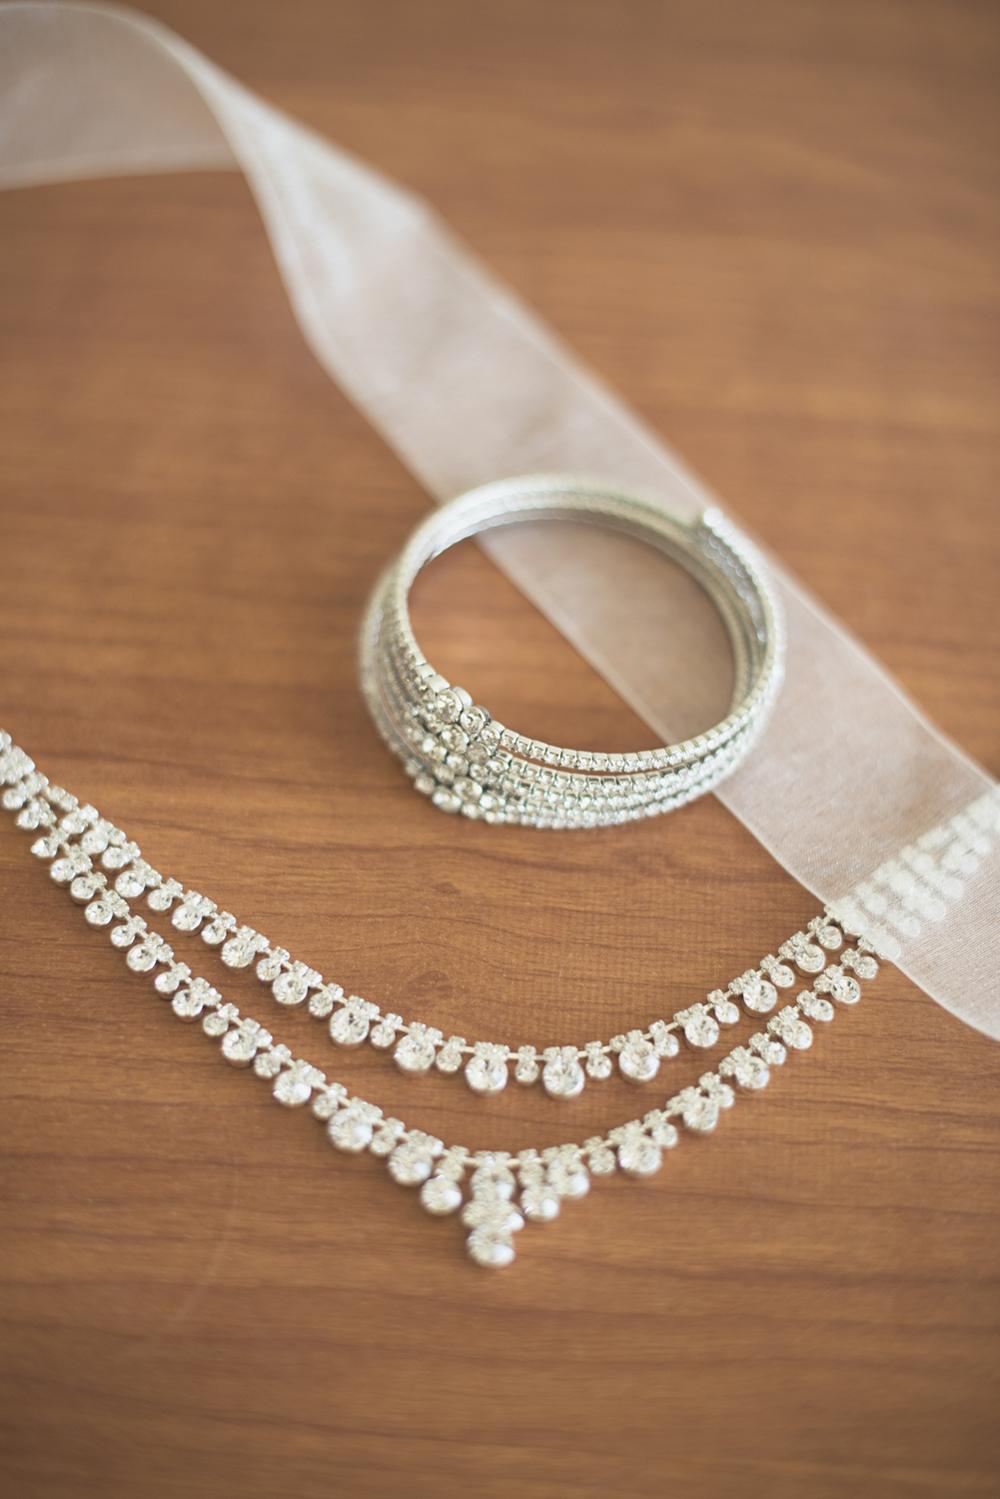 Virginia Beach Oceanfront Wedding | Bridal jewelry details